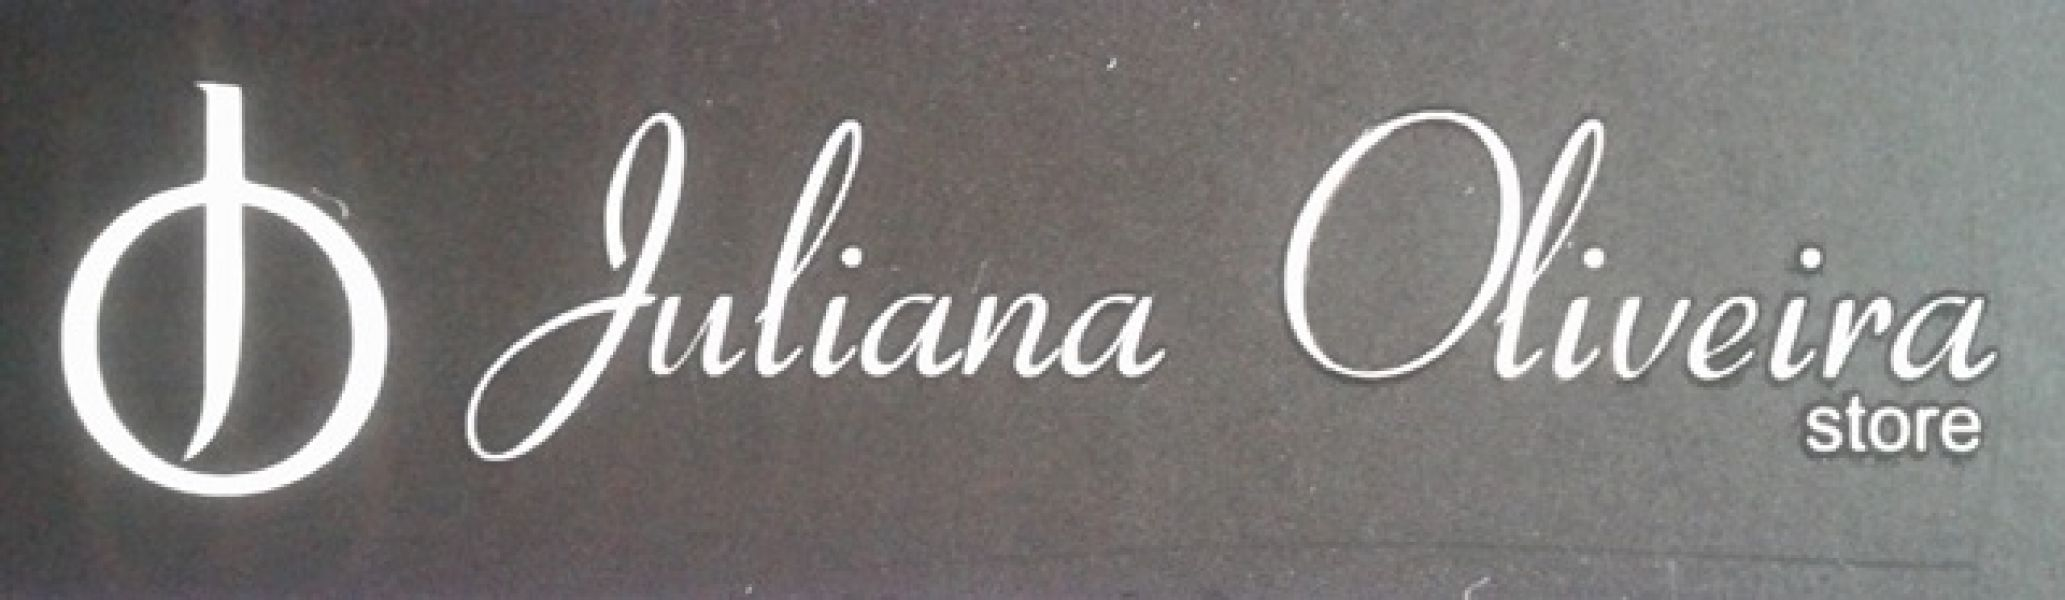 JULIANA OLIVEIRA Store